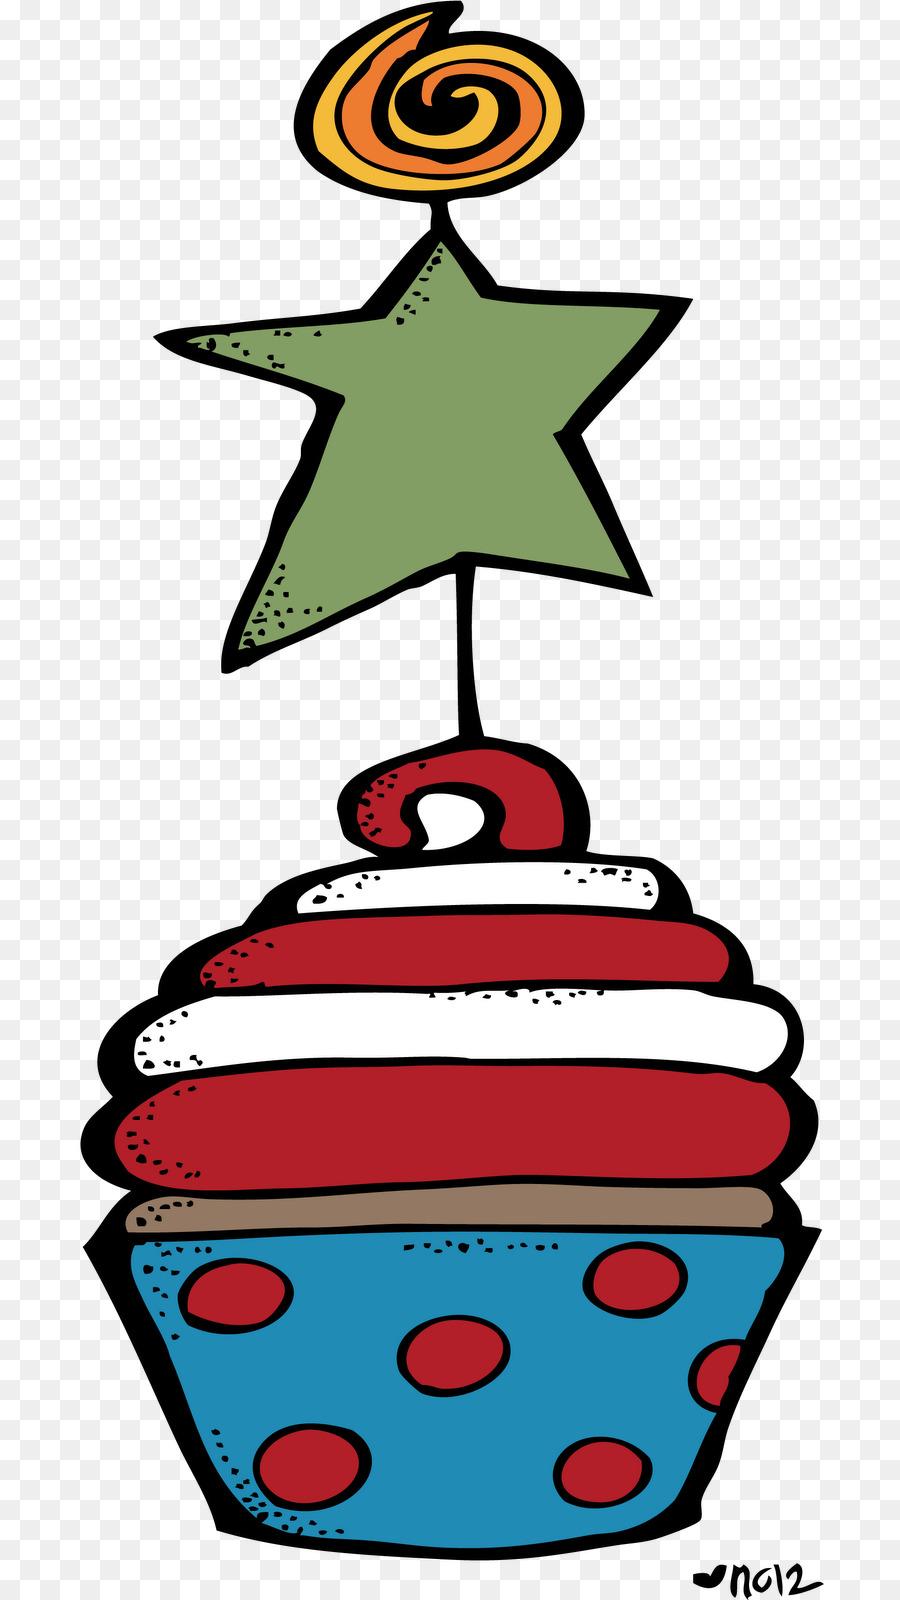 birthday cake cupcake clip art criss cross applesauce clipart png rh kisspng com